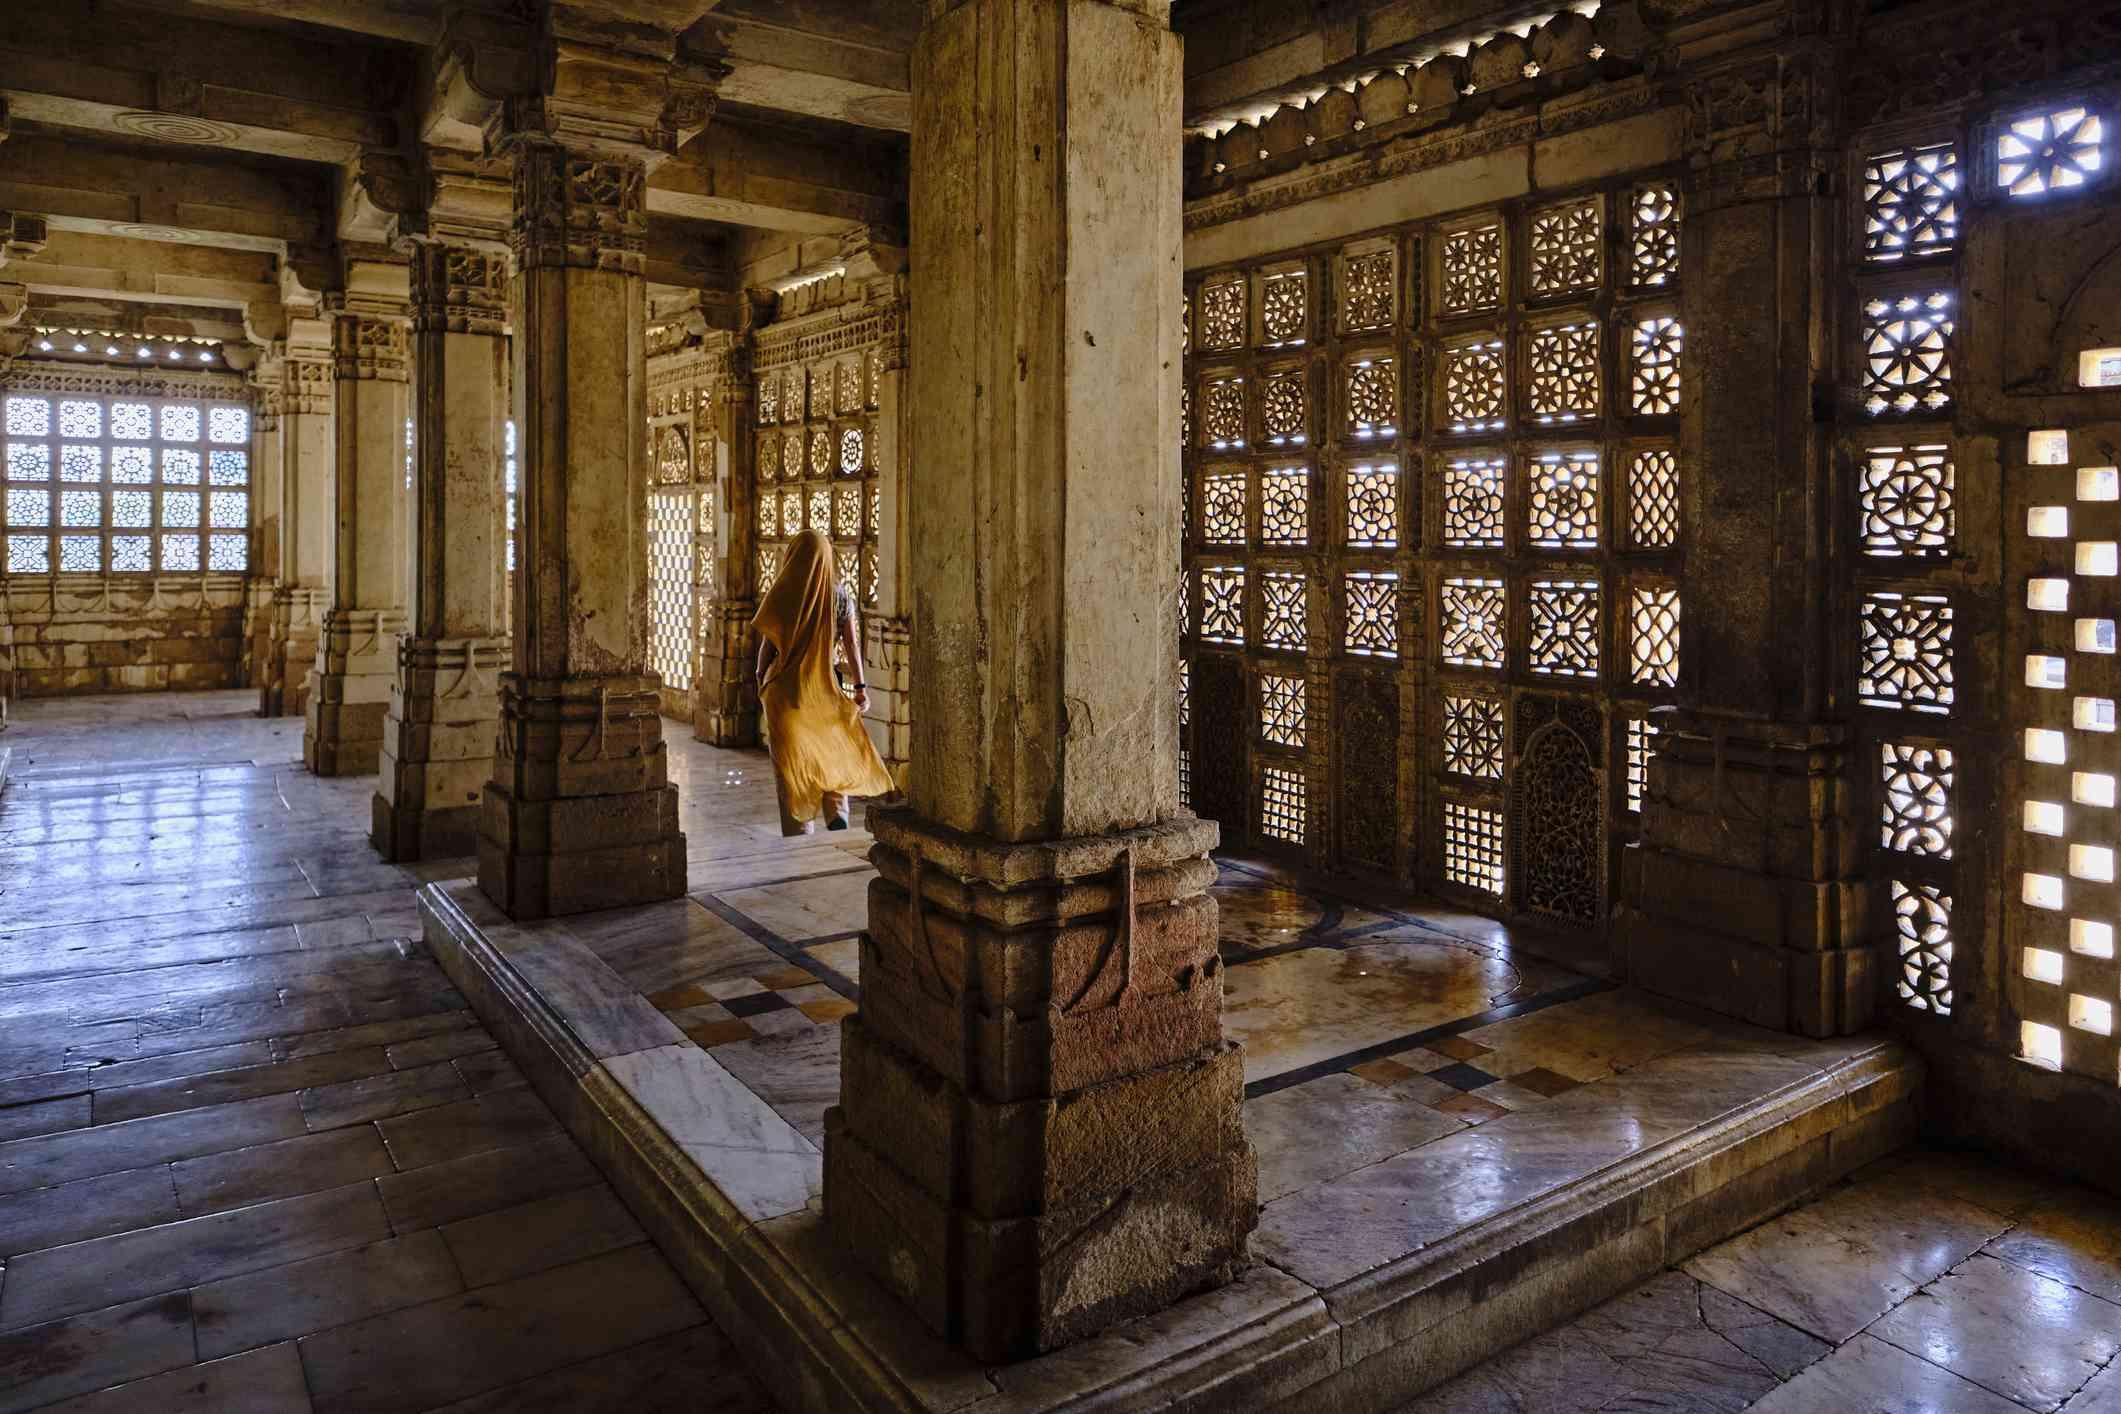 India, Gujarat, Ahmedabad, Sarkhej Roza tomb